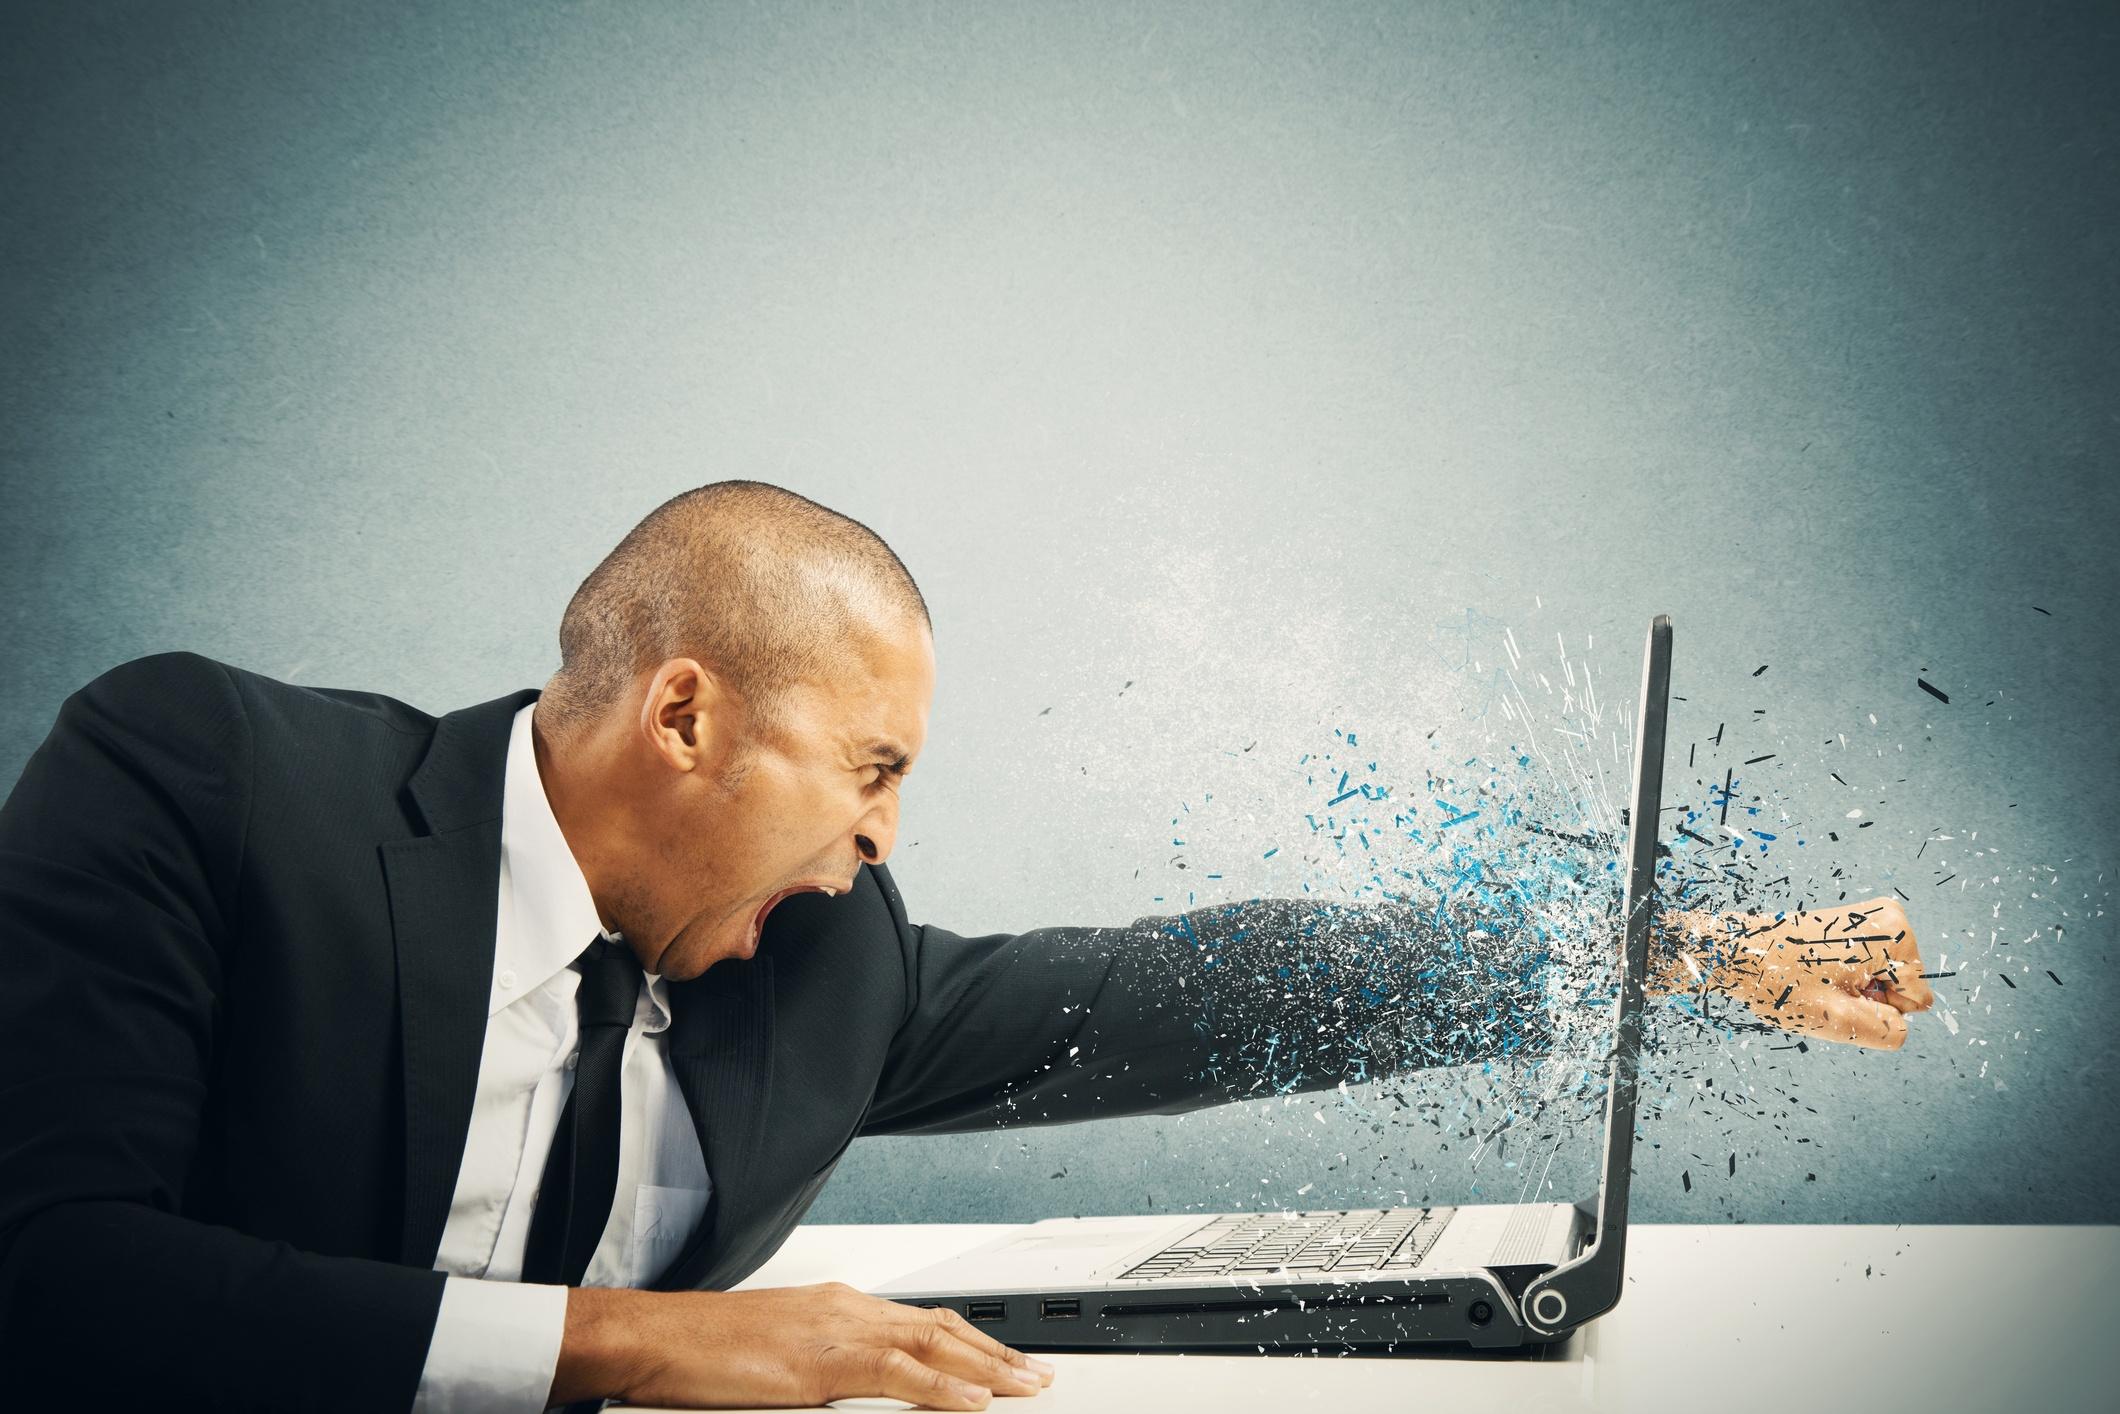 fight-ad-fraud-iStock-636481468